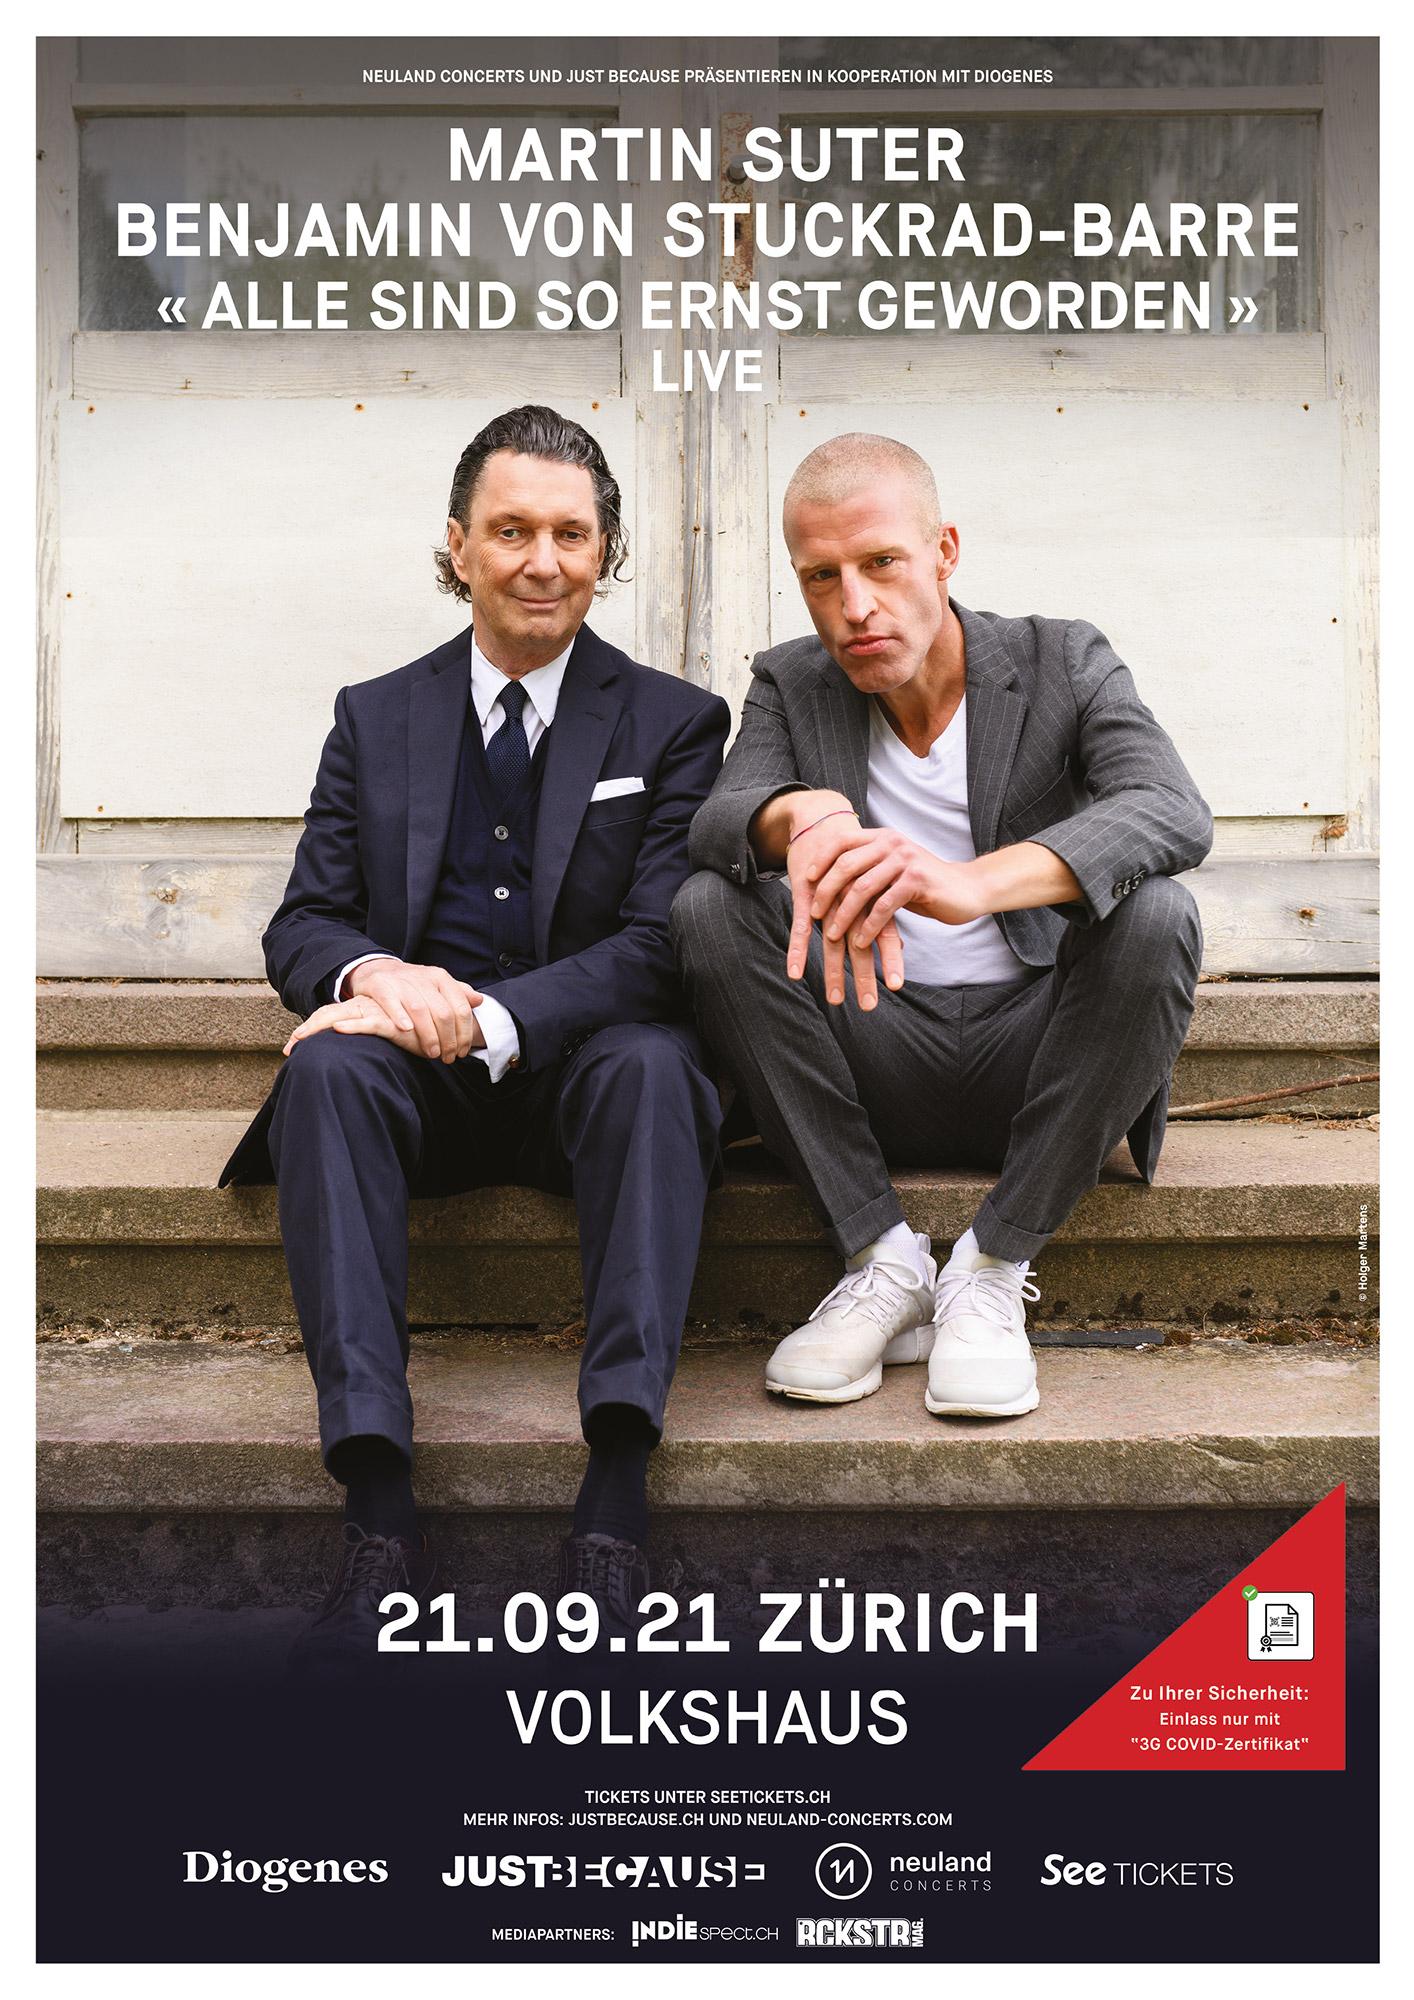 Martin Suter & Benjamin von Stuckrad-Barre